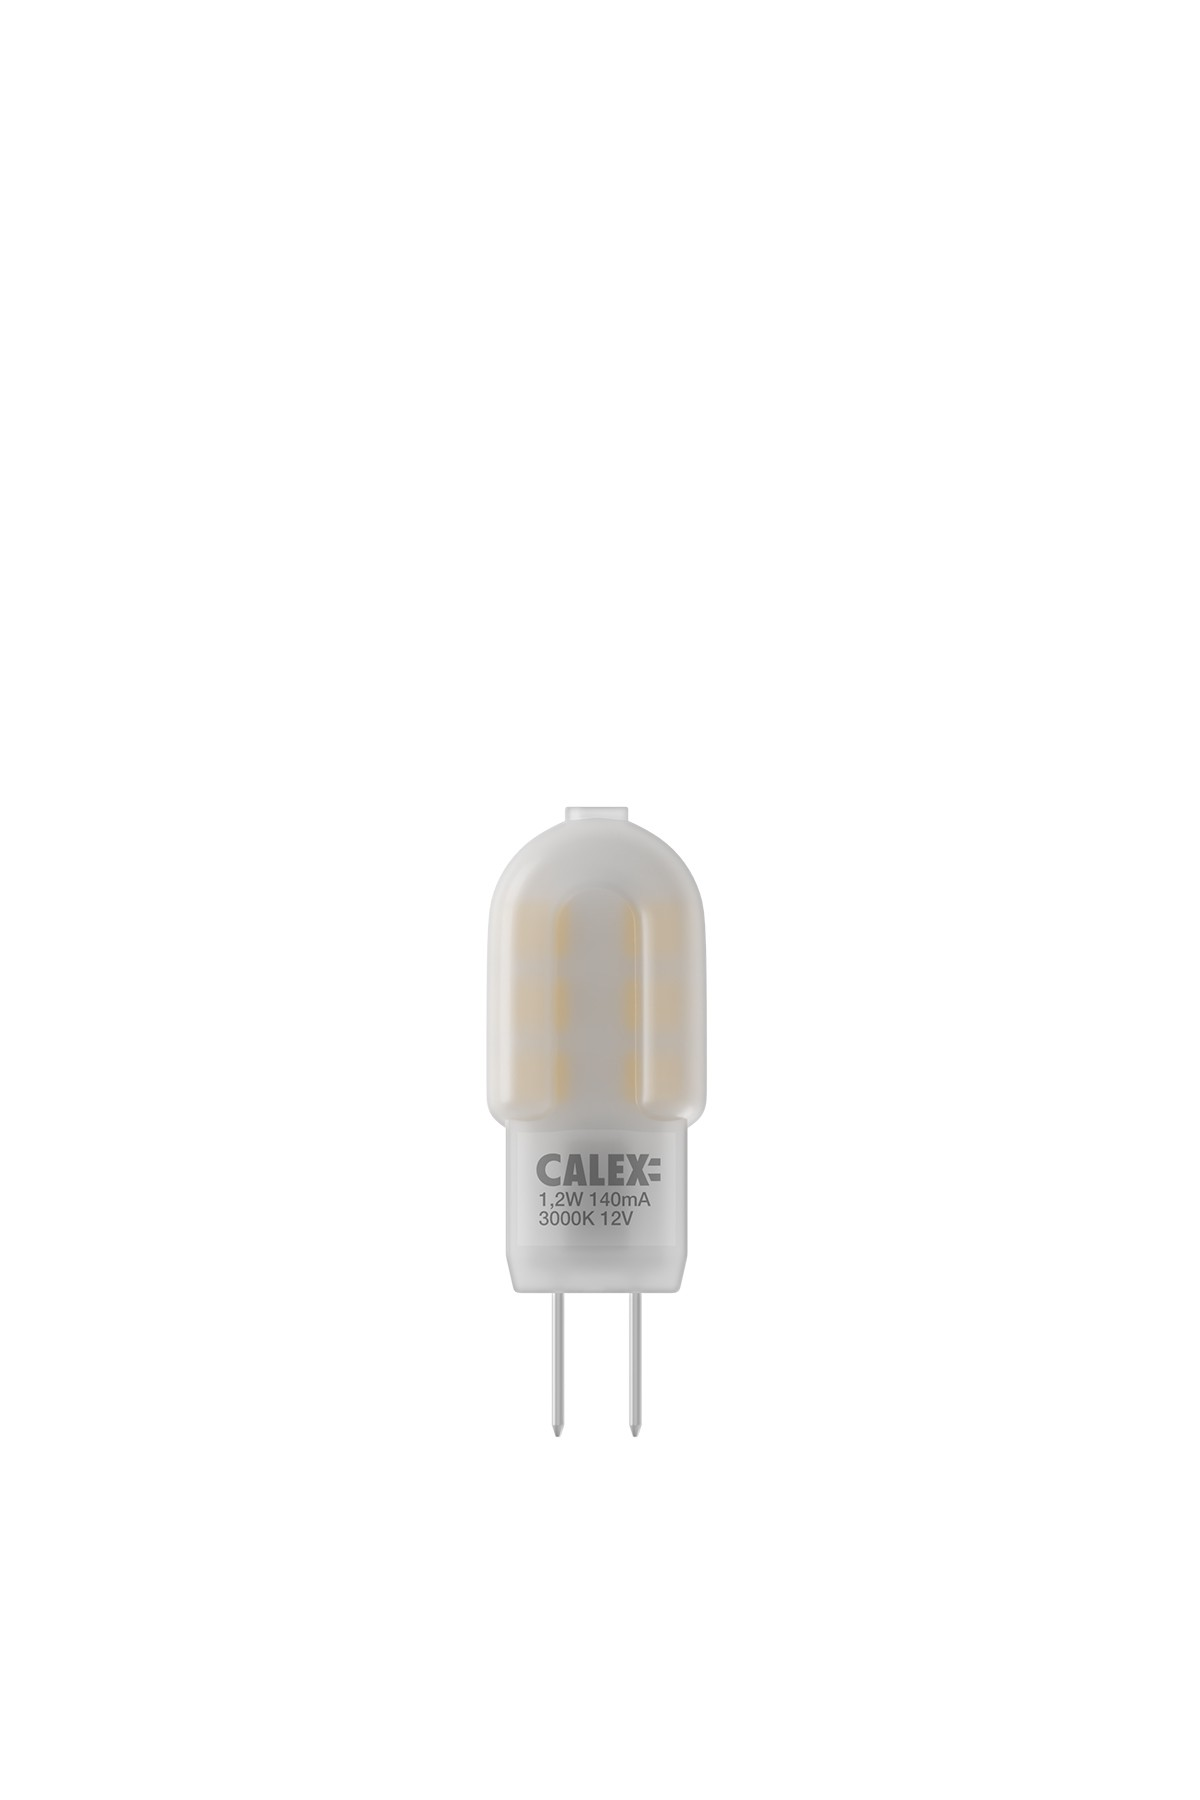 Led Burner Lamps 12v 1 2w G4 Calex